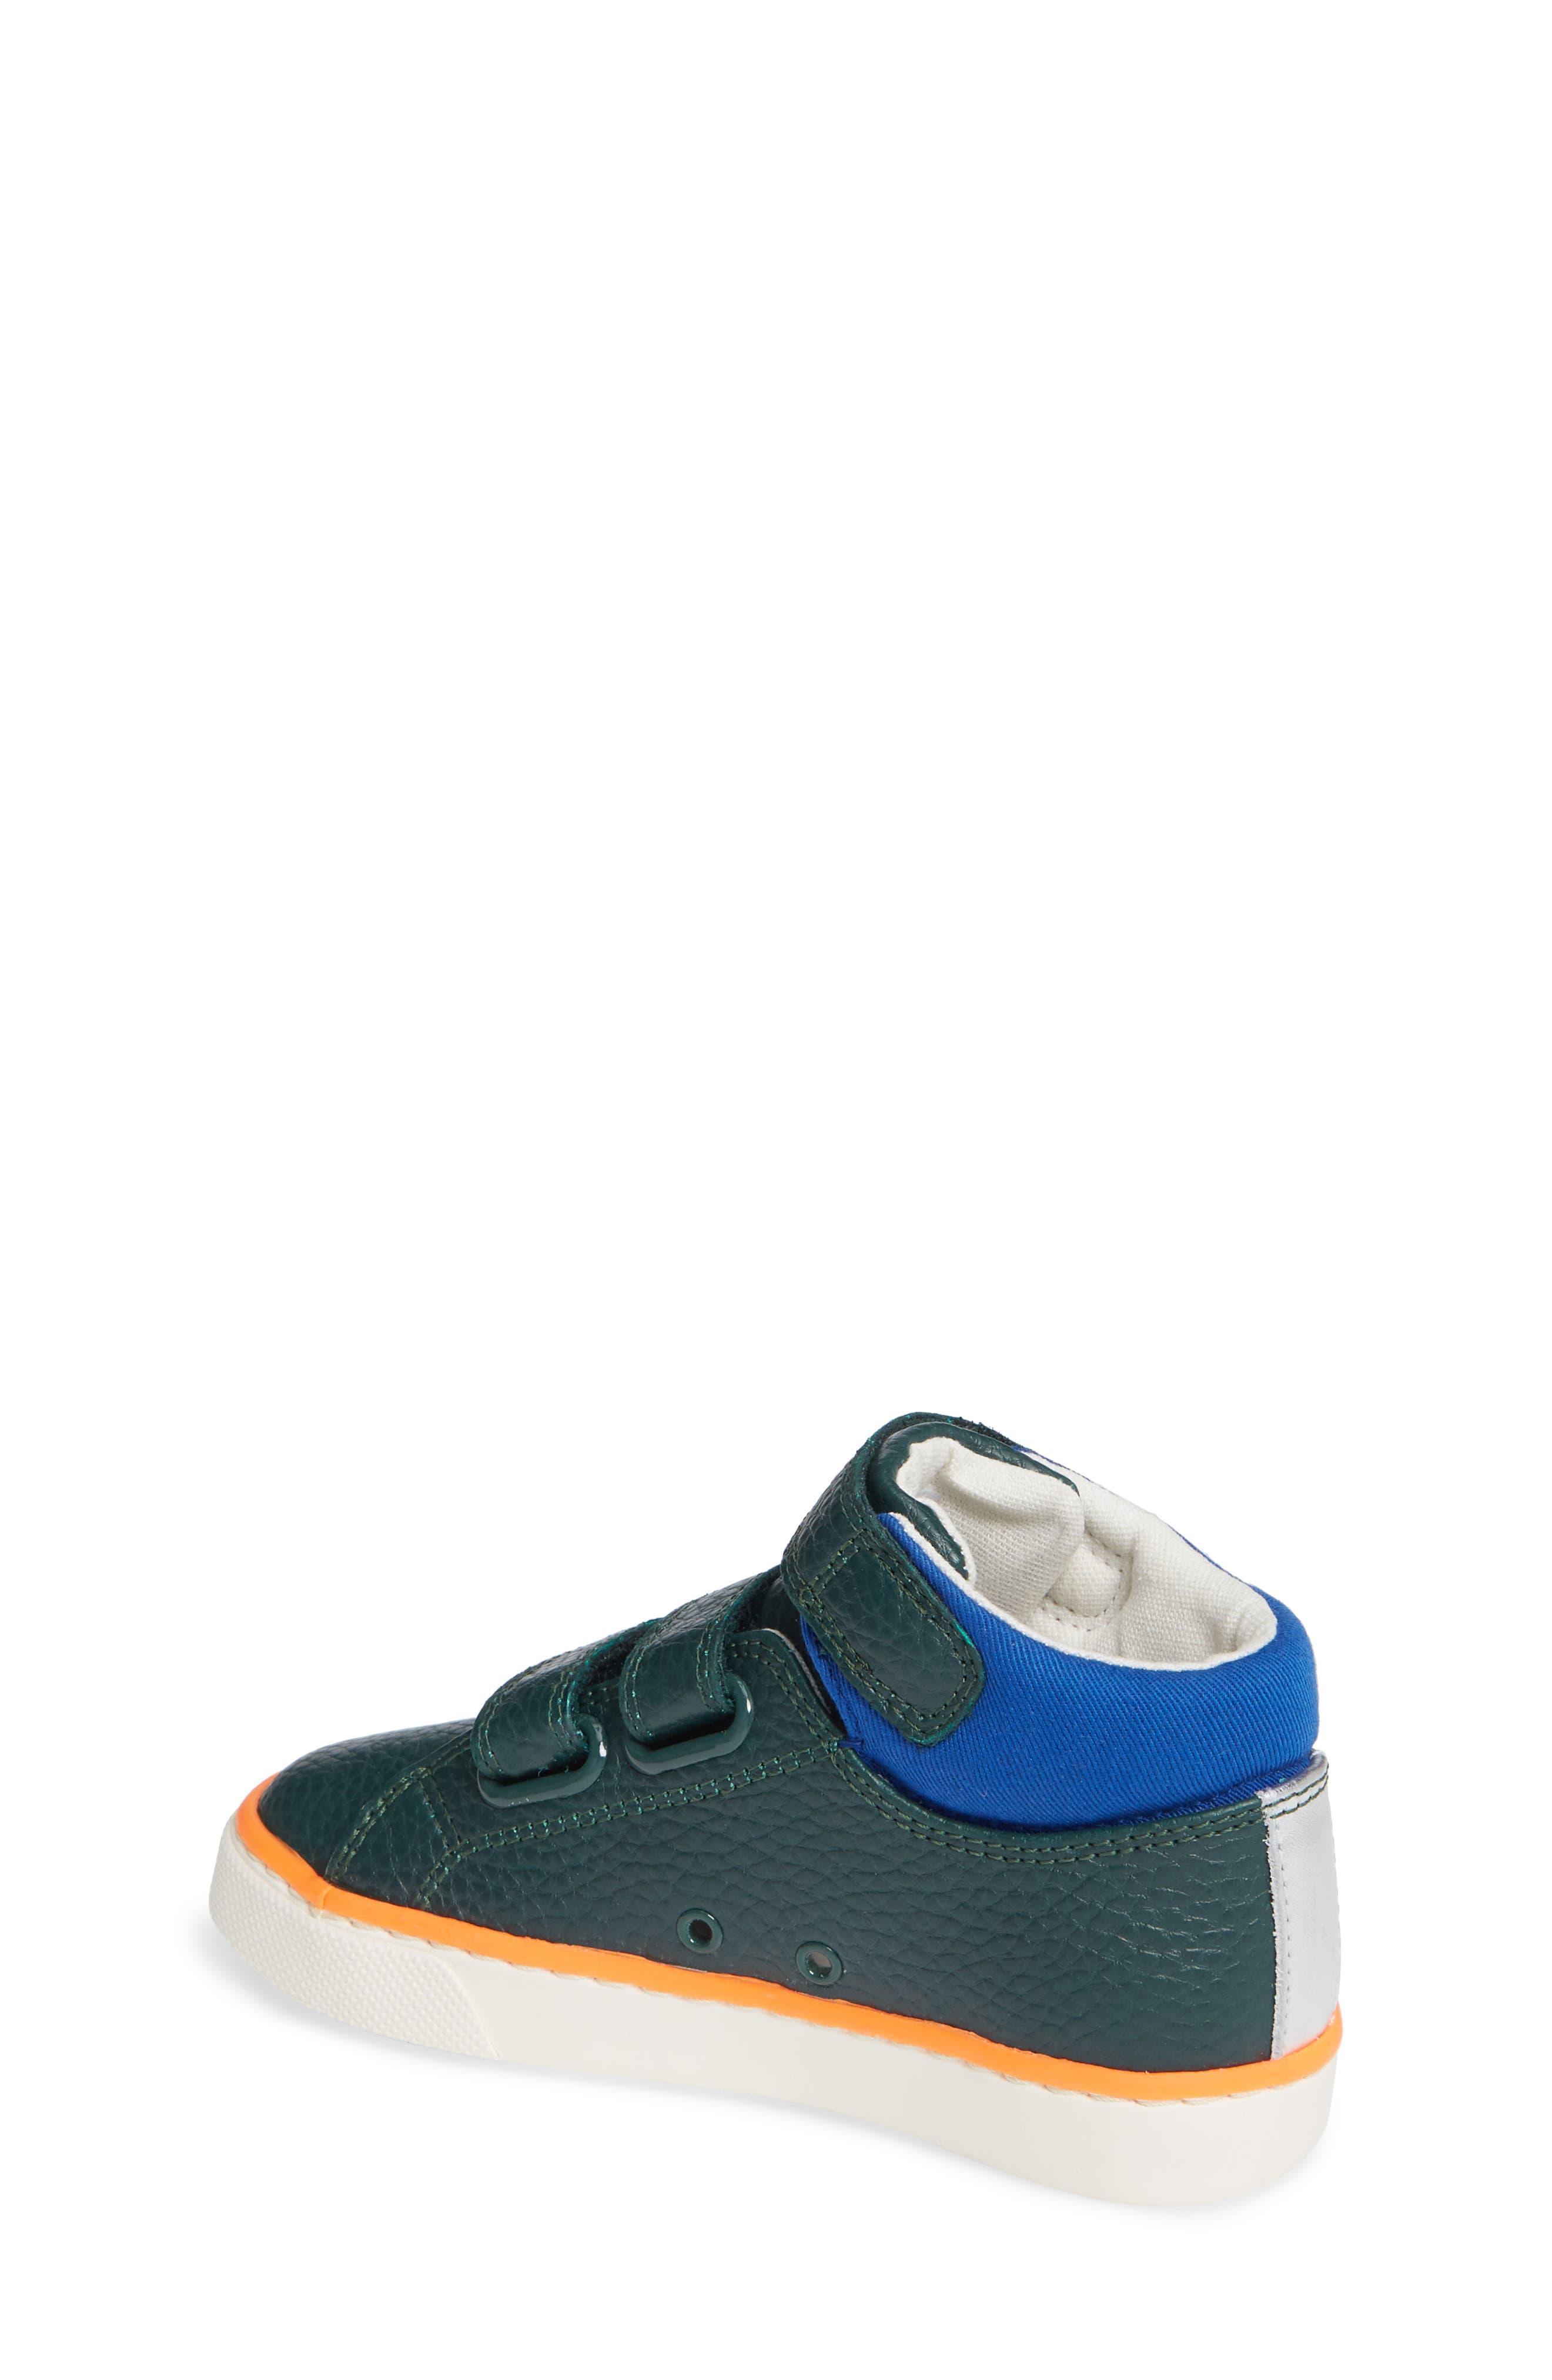 High Top Sneaker,                             Alternate thumbnail 2, color,                             SCOTTS PINE GREEN